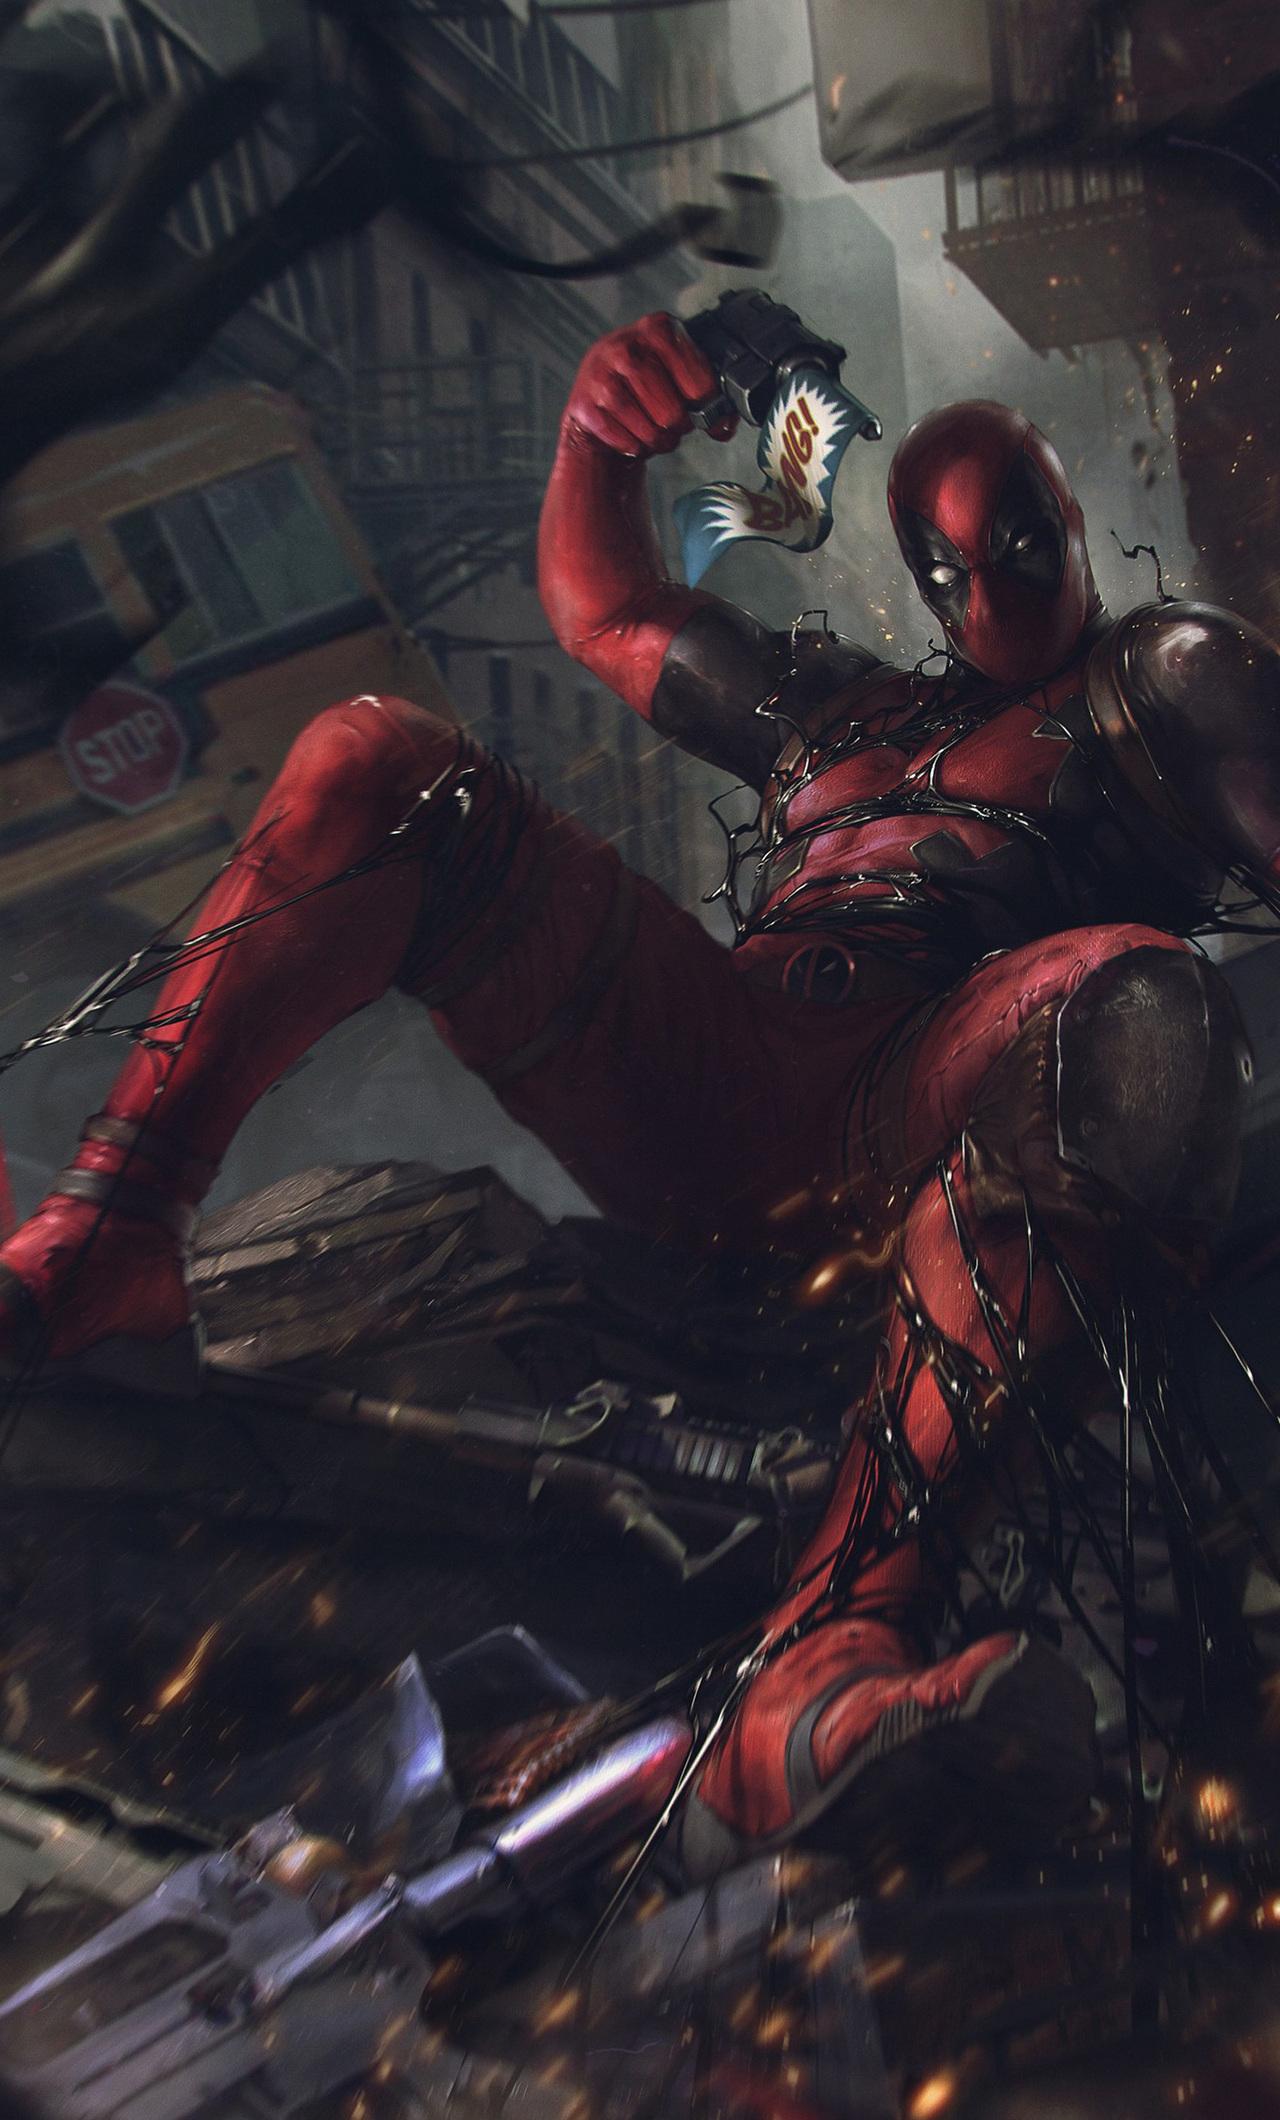 1280x2120 Deadpool Vs Venom Symbiote Iphone 6 Hd 4k Wallpapers